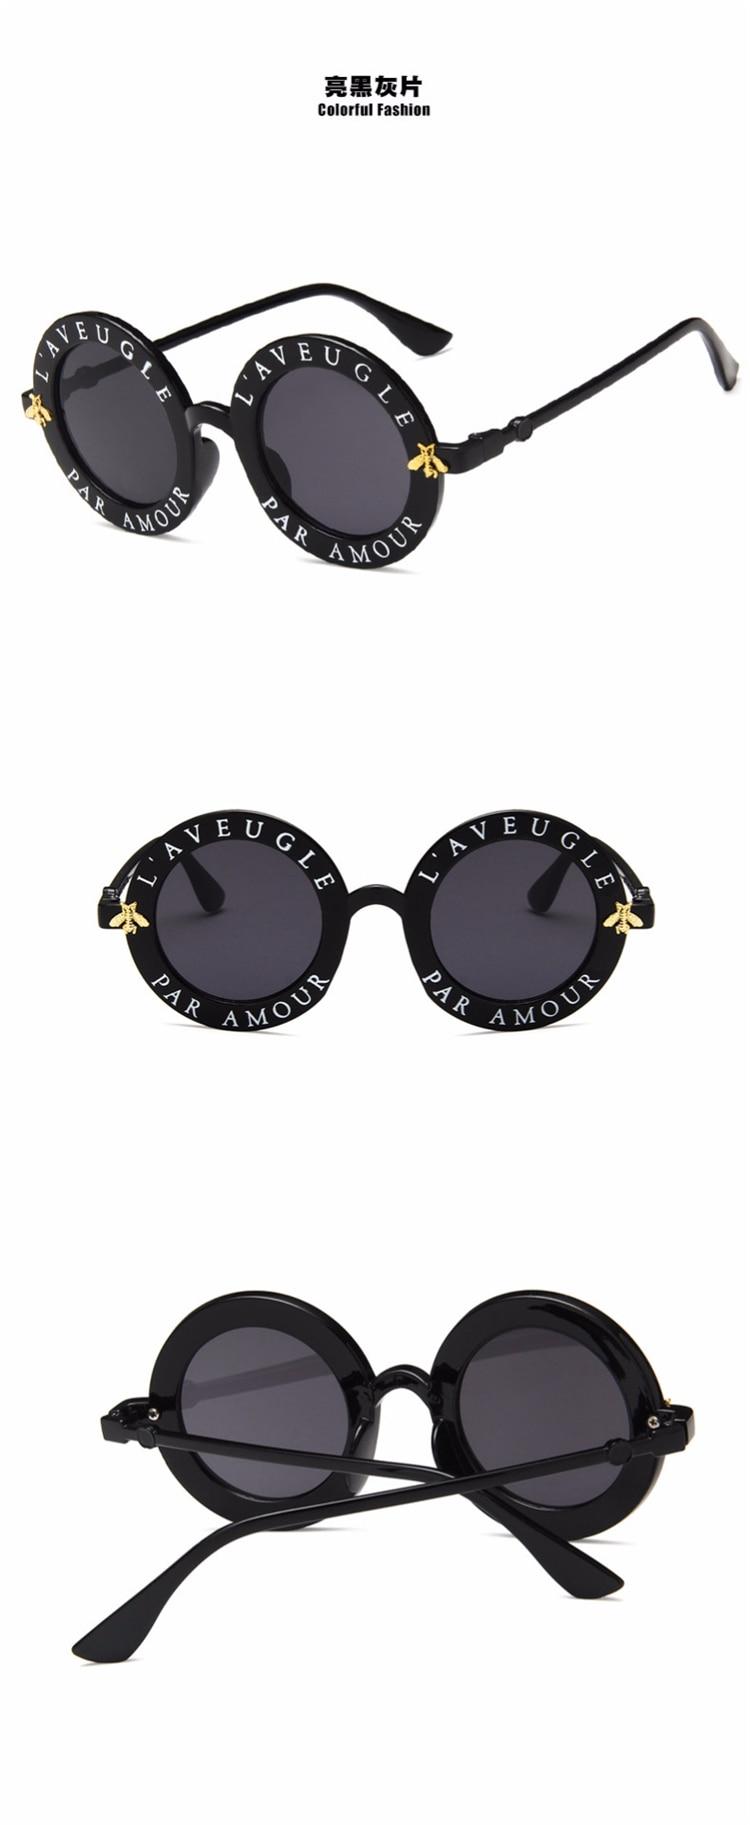 Newest-Fashion-Round-Sunglasses-Women-Brand-Designer-Vintage-Gradient-Shades-Sun-Glasses-UV400-Oculos-Feminino (4)